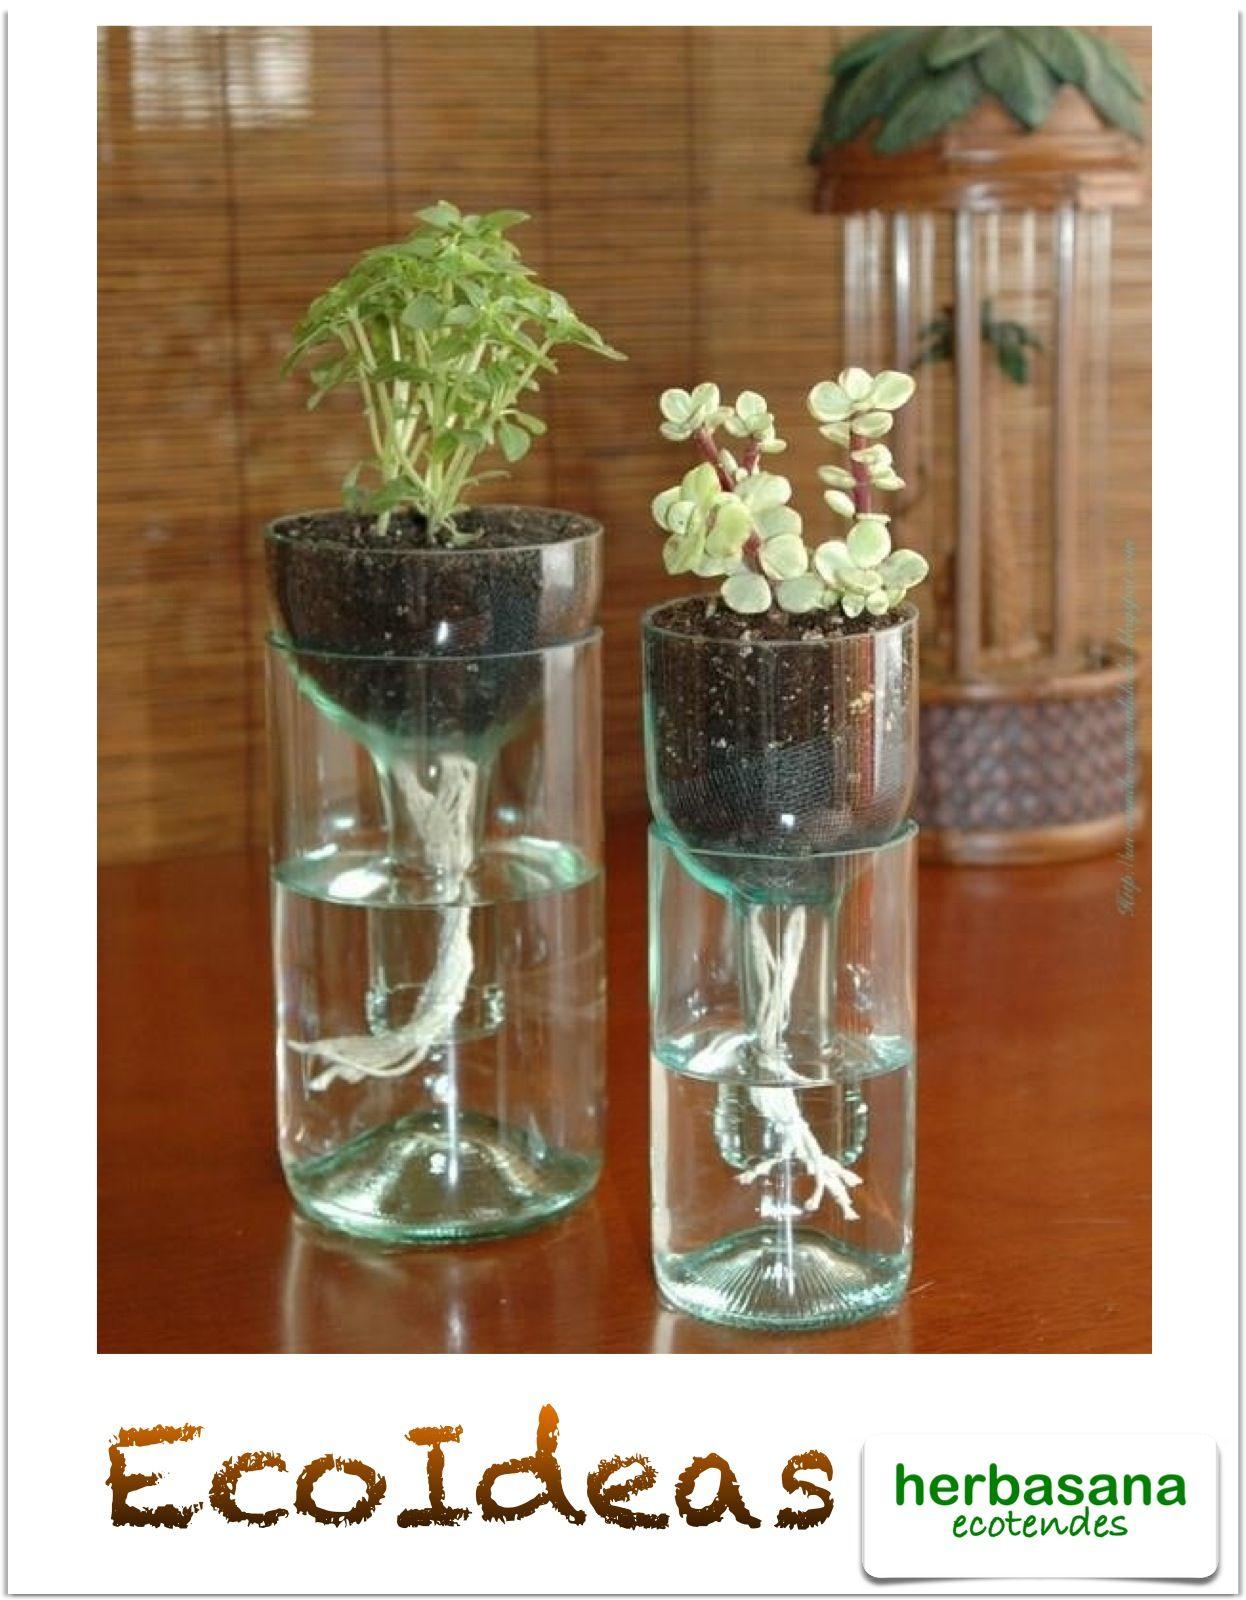 Maceteros con botellas de vidrio vidrio pinterest - Que hacer con botellas de vidrio ...